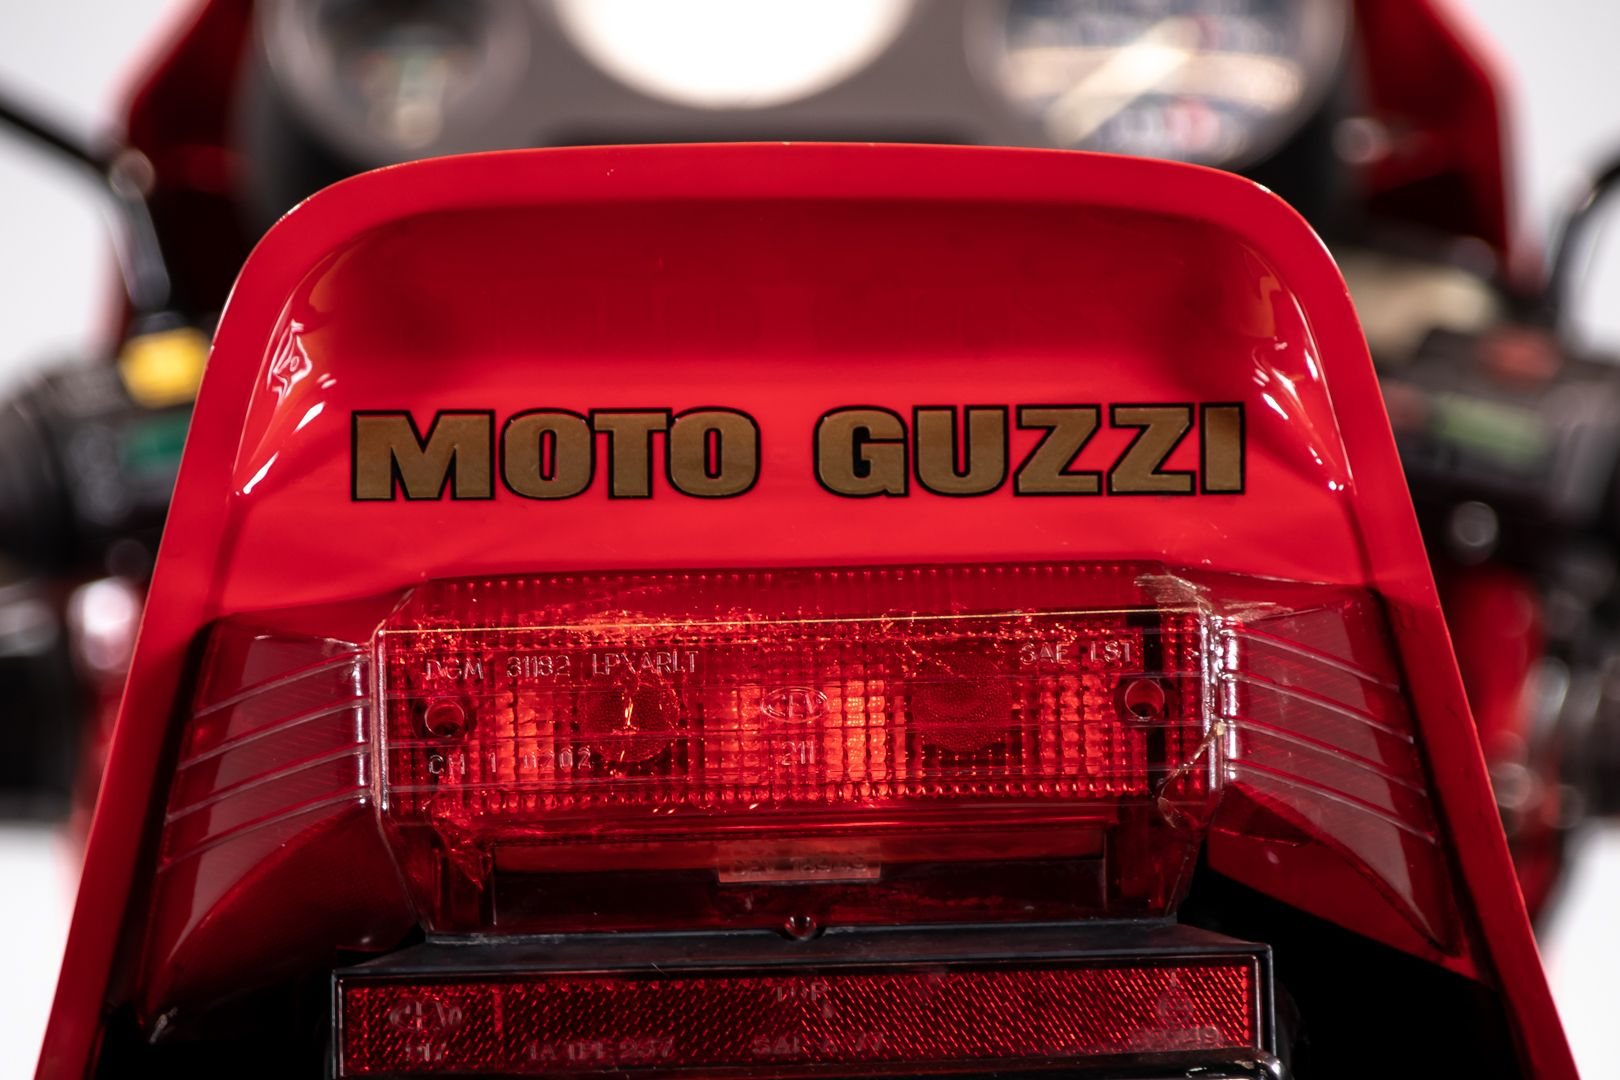 1985 Moto Guzzi le mans 1000 57539